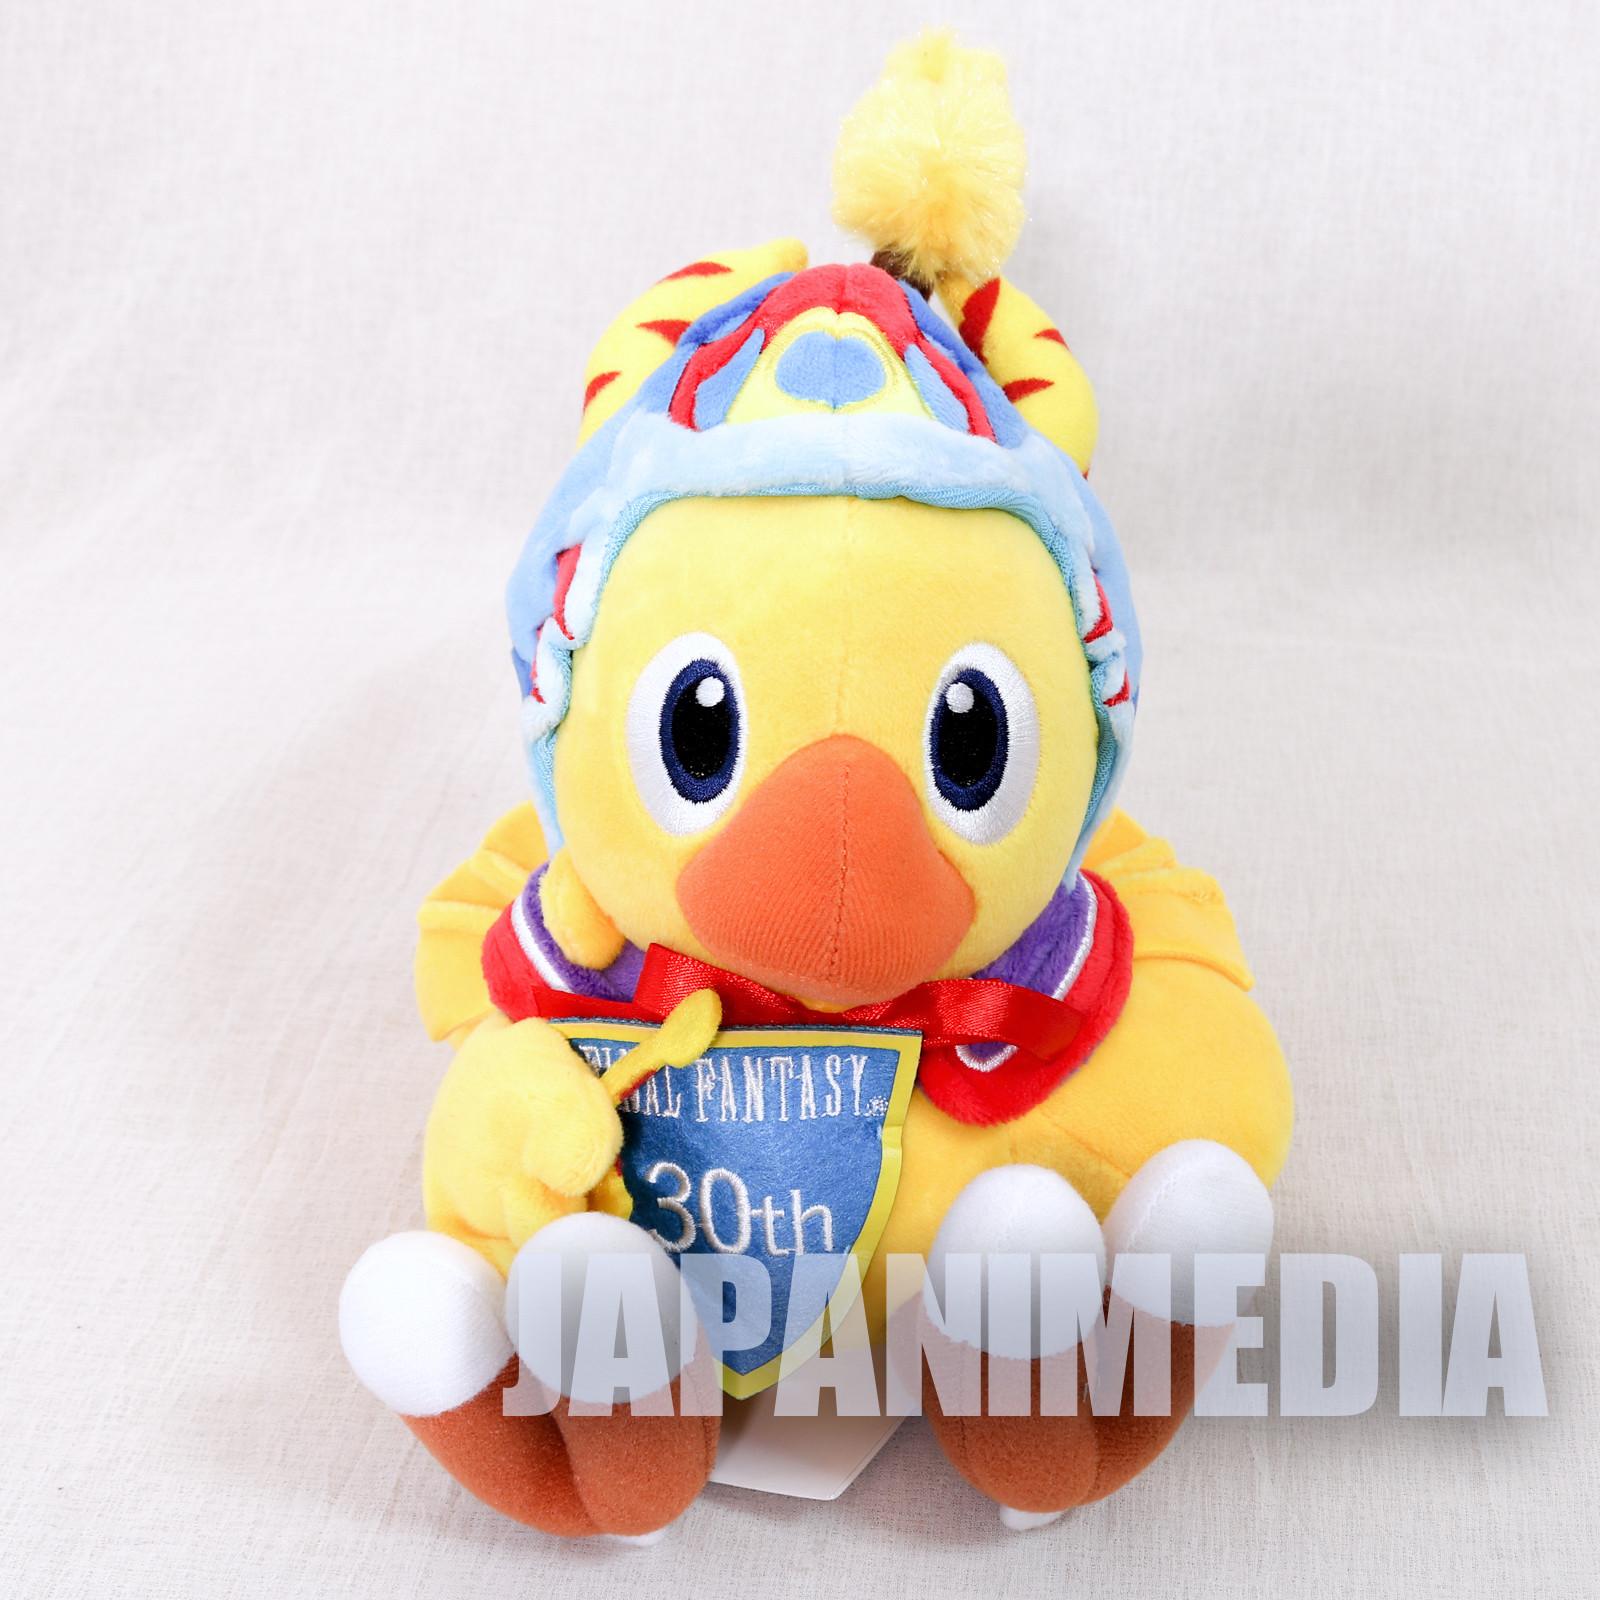 Final Fantasy Chocobo Plush Doll 30th Anniversary Square Enix JAPAN